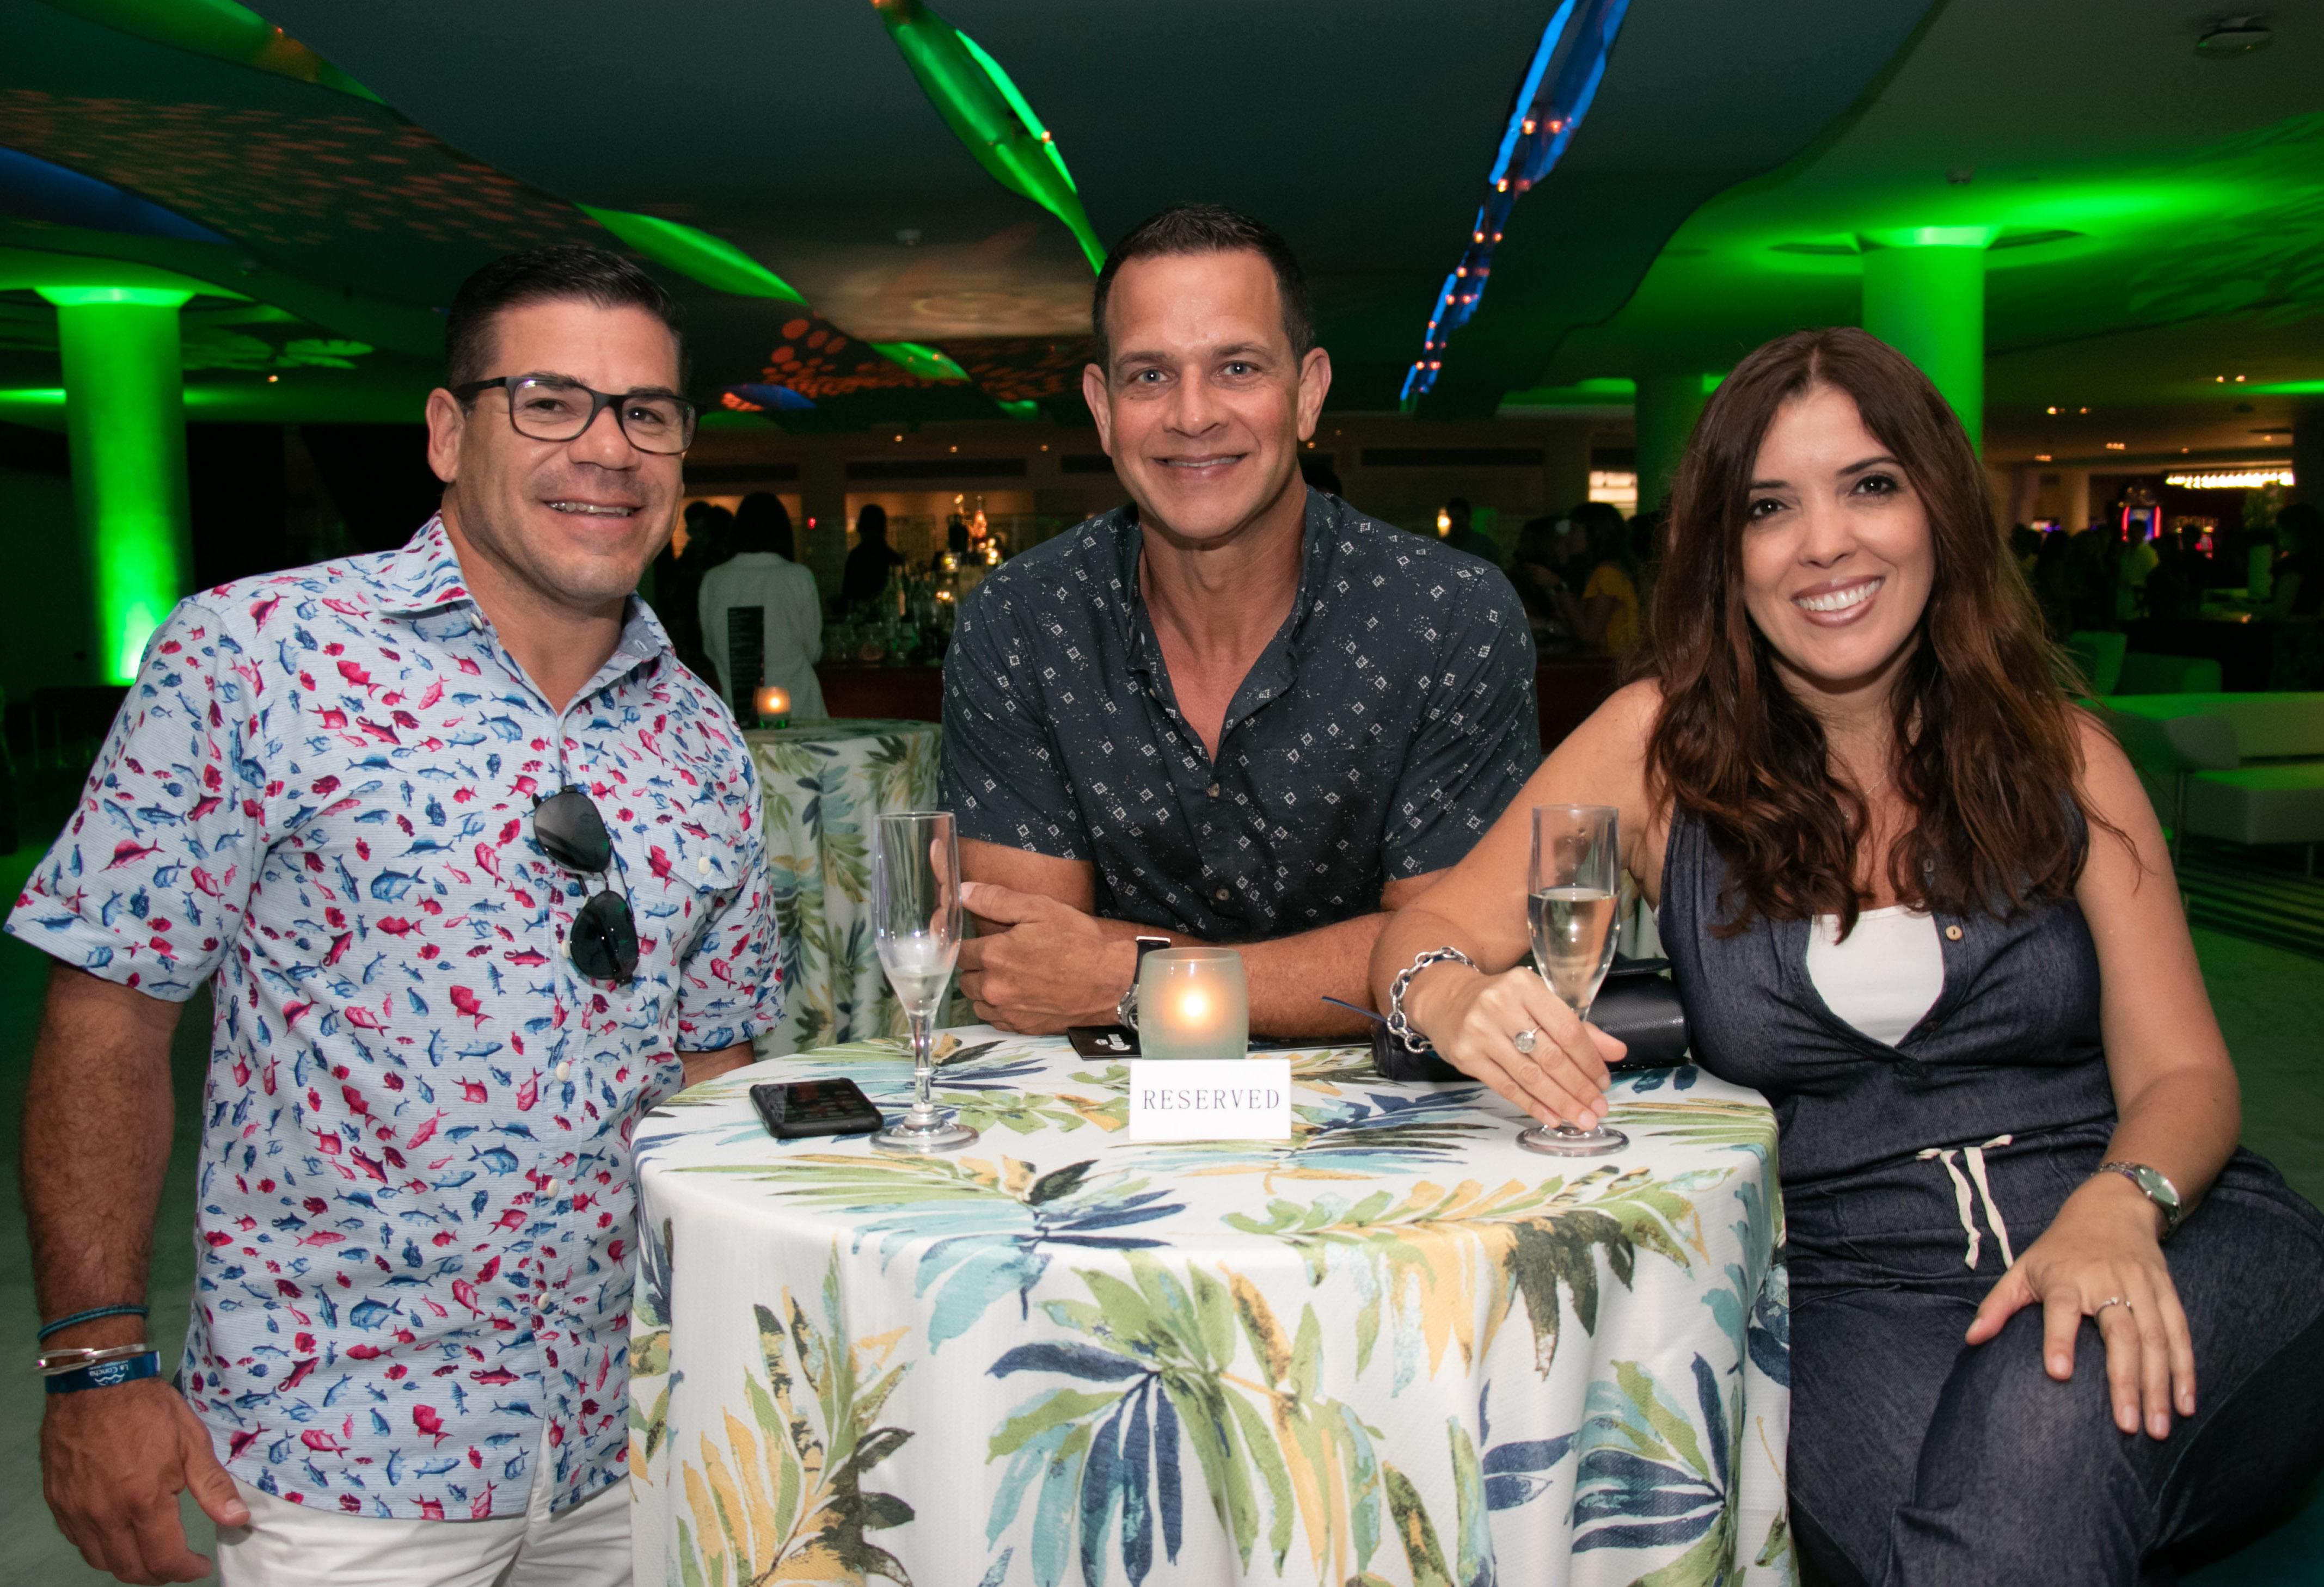 Pedro Pagán, Luis B y Jessica Lugo. (Suministrada)